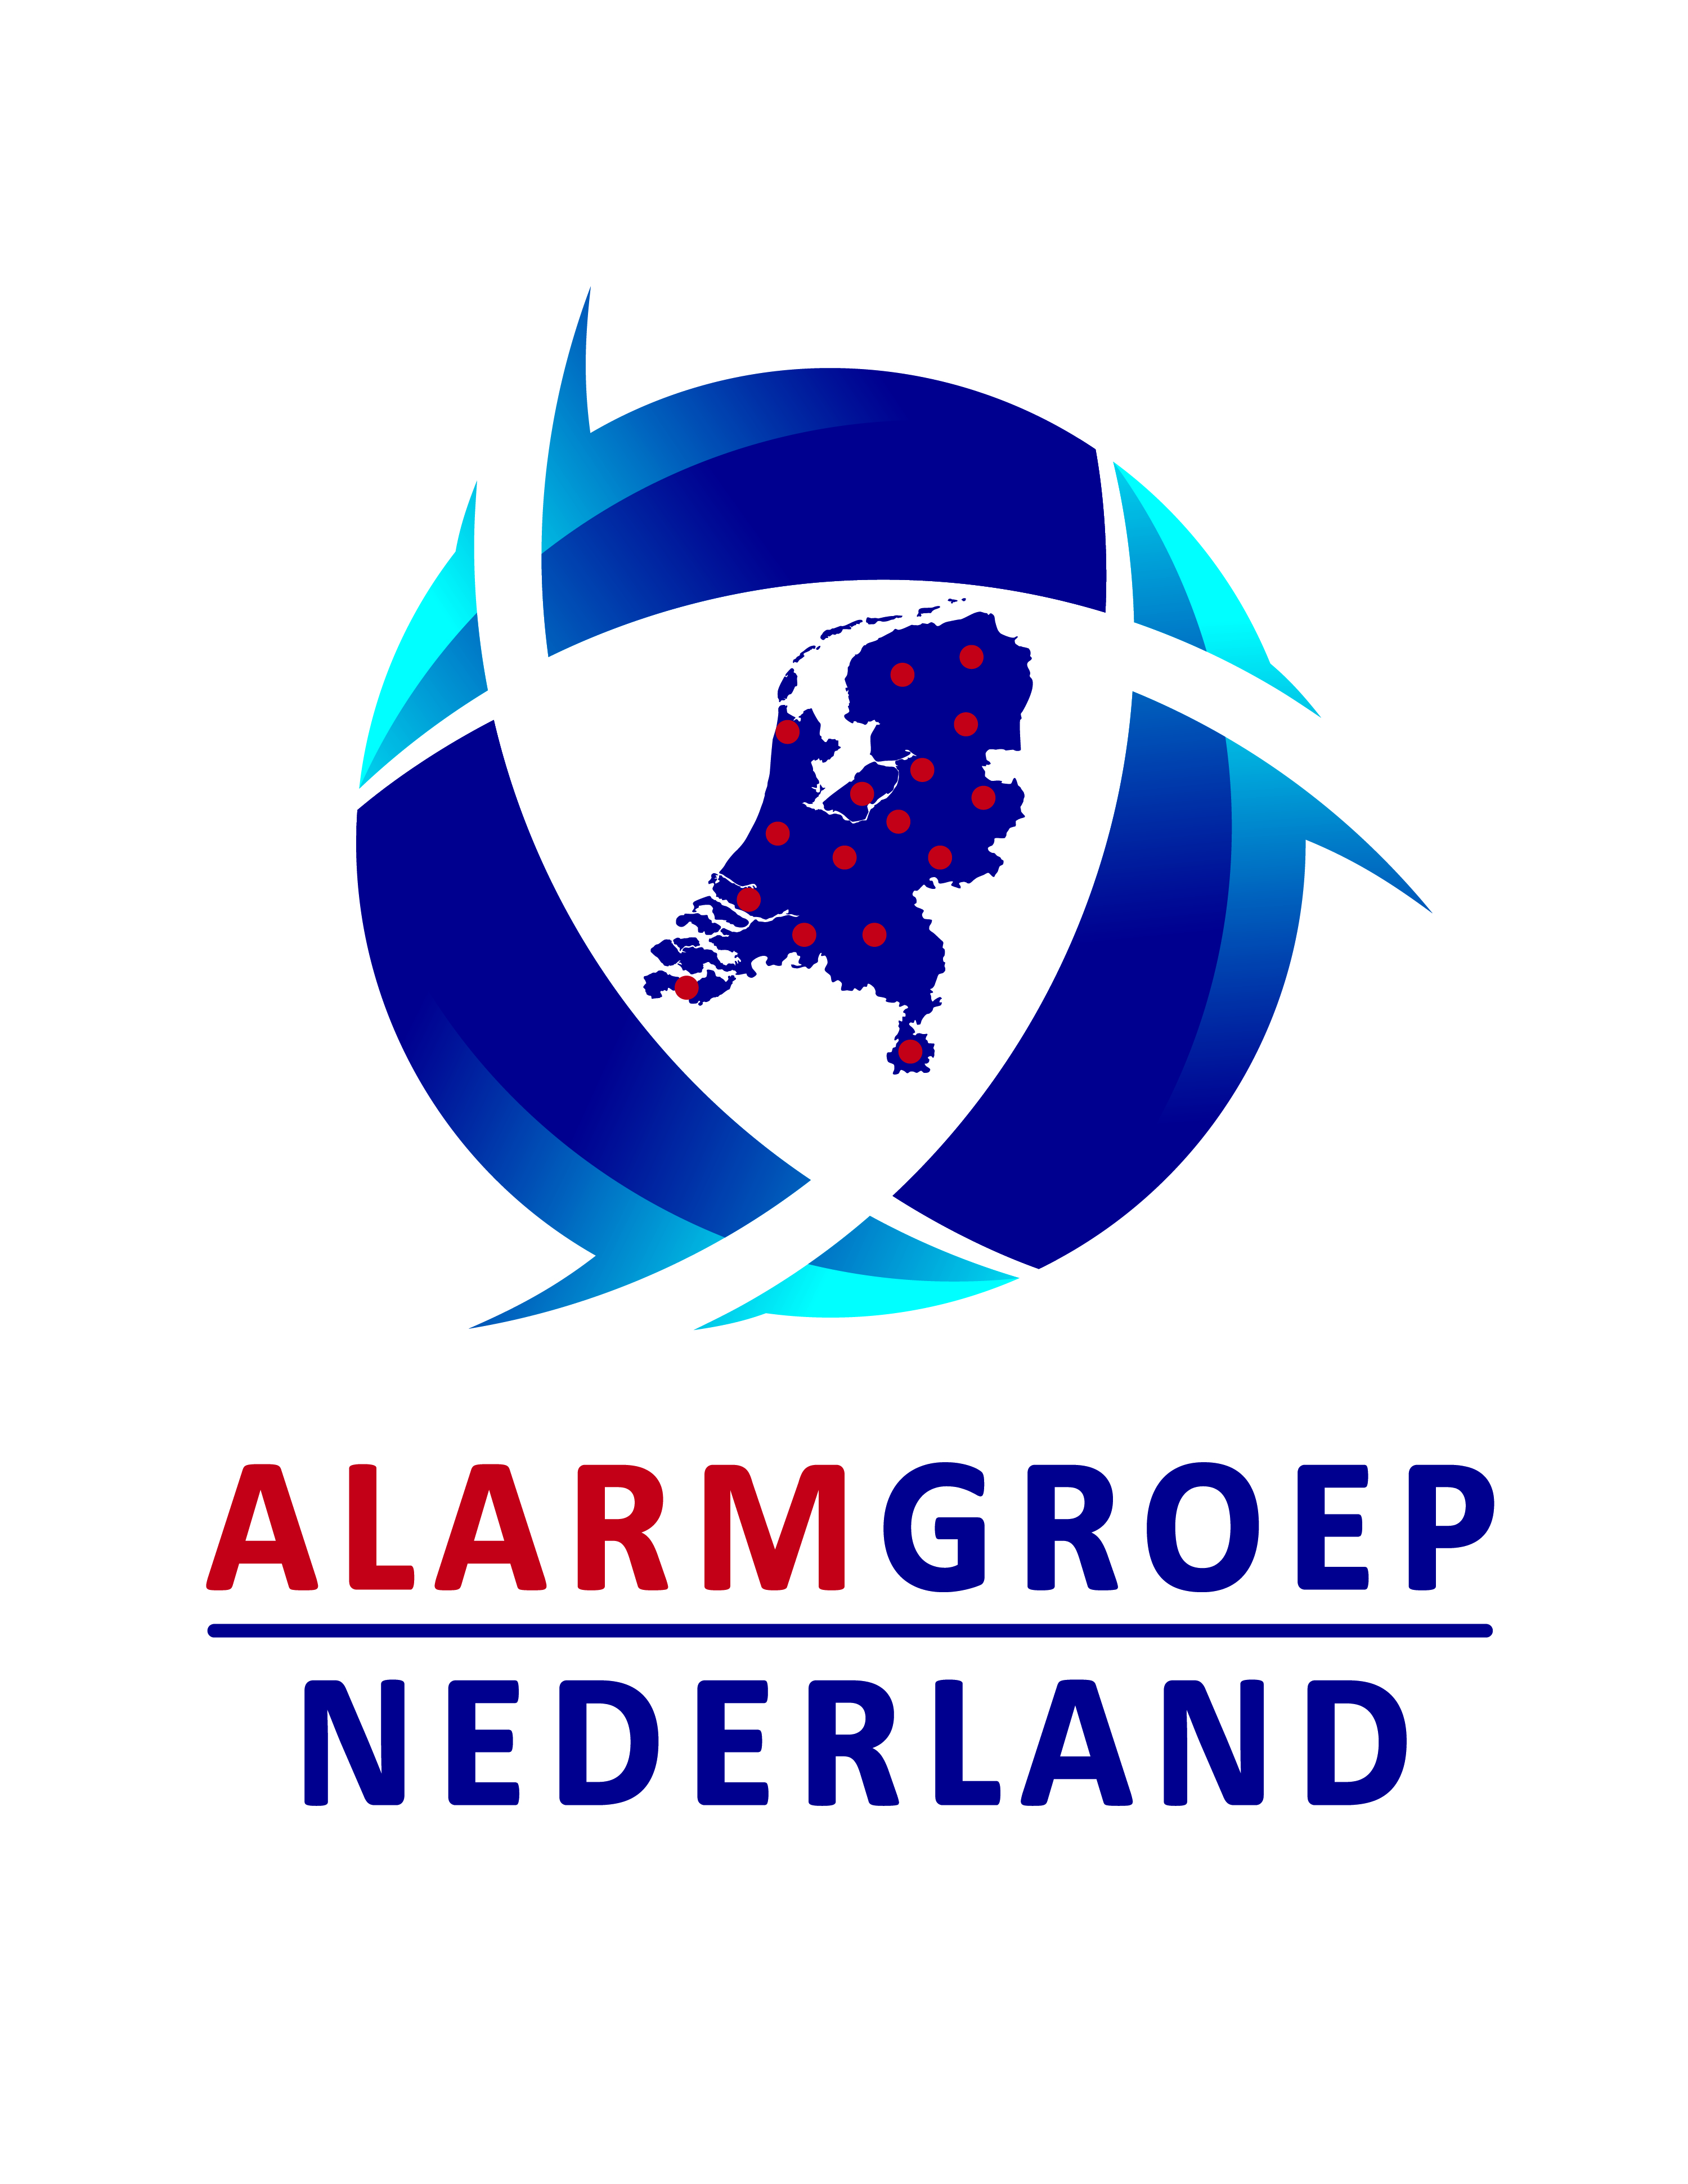 Alarmgroep Nederland